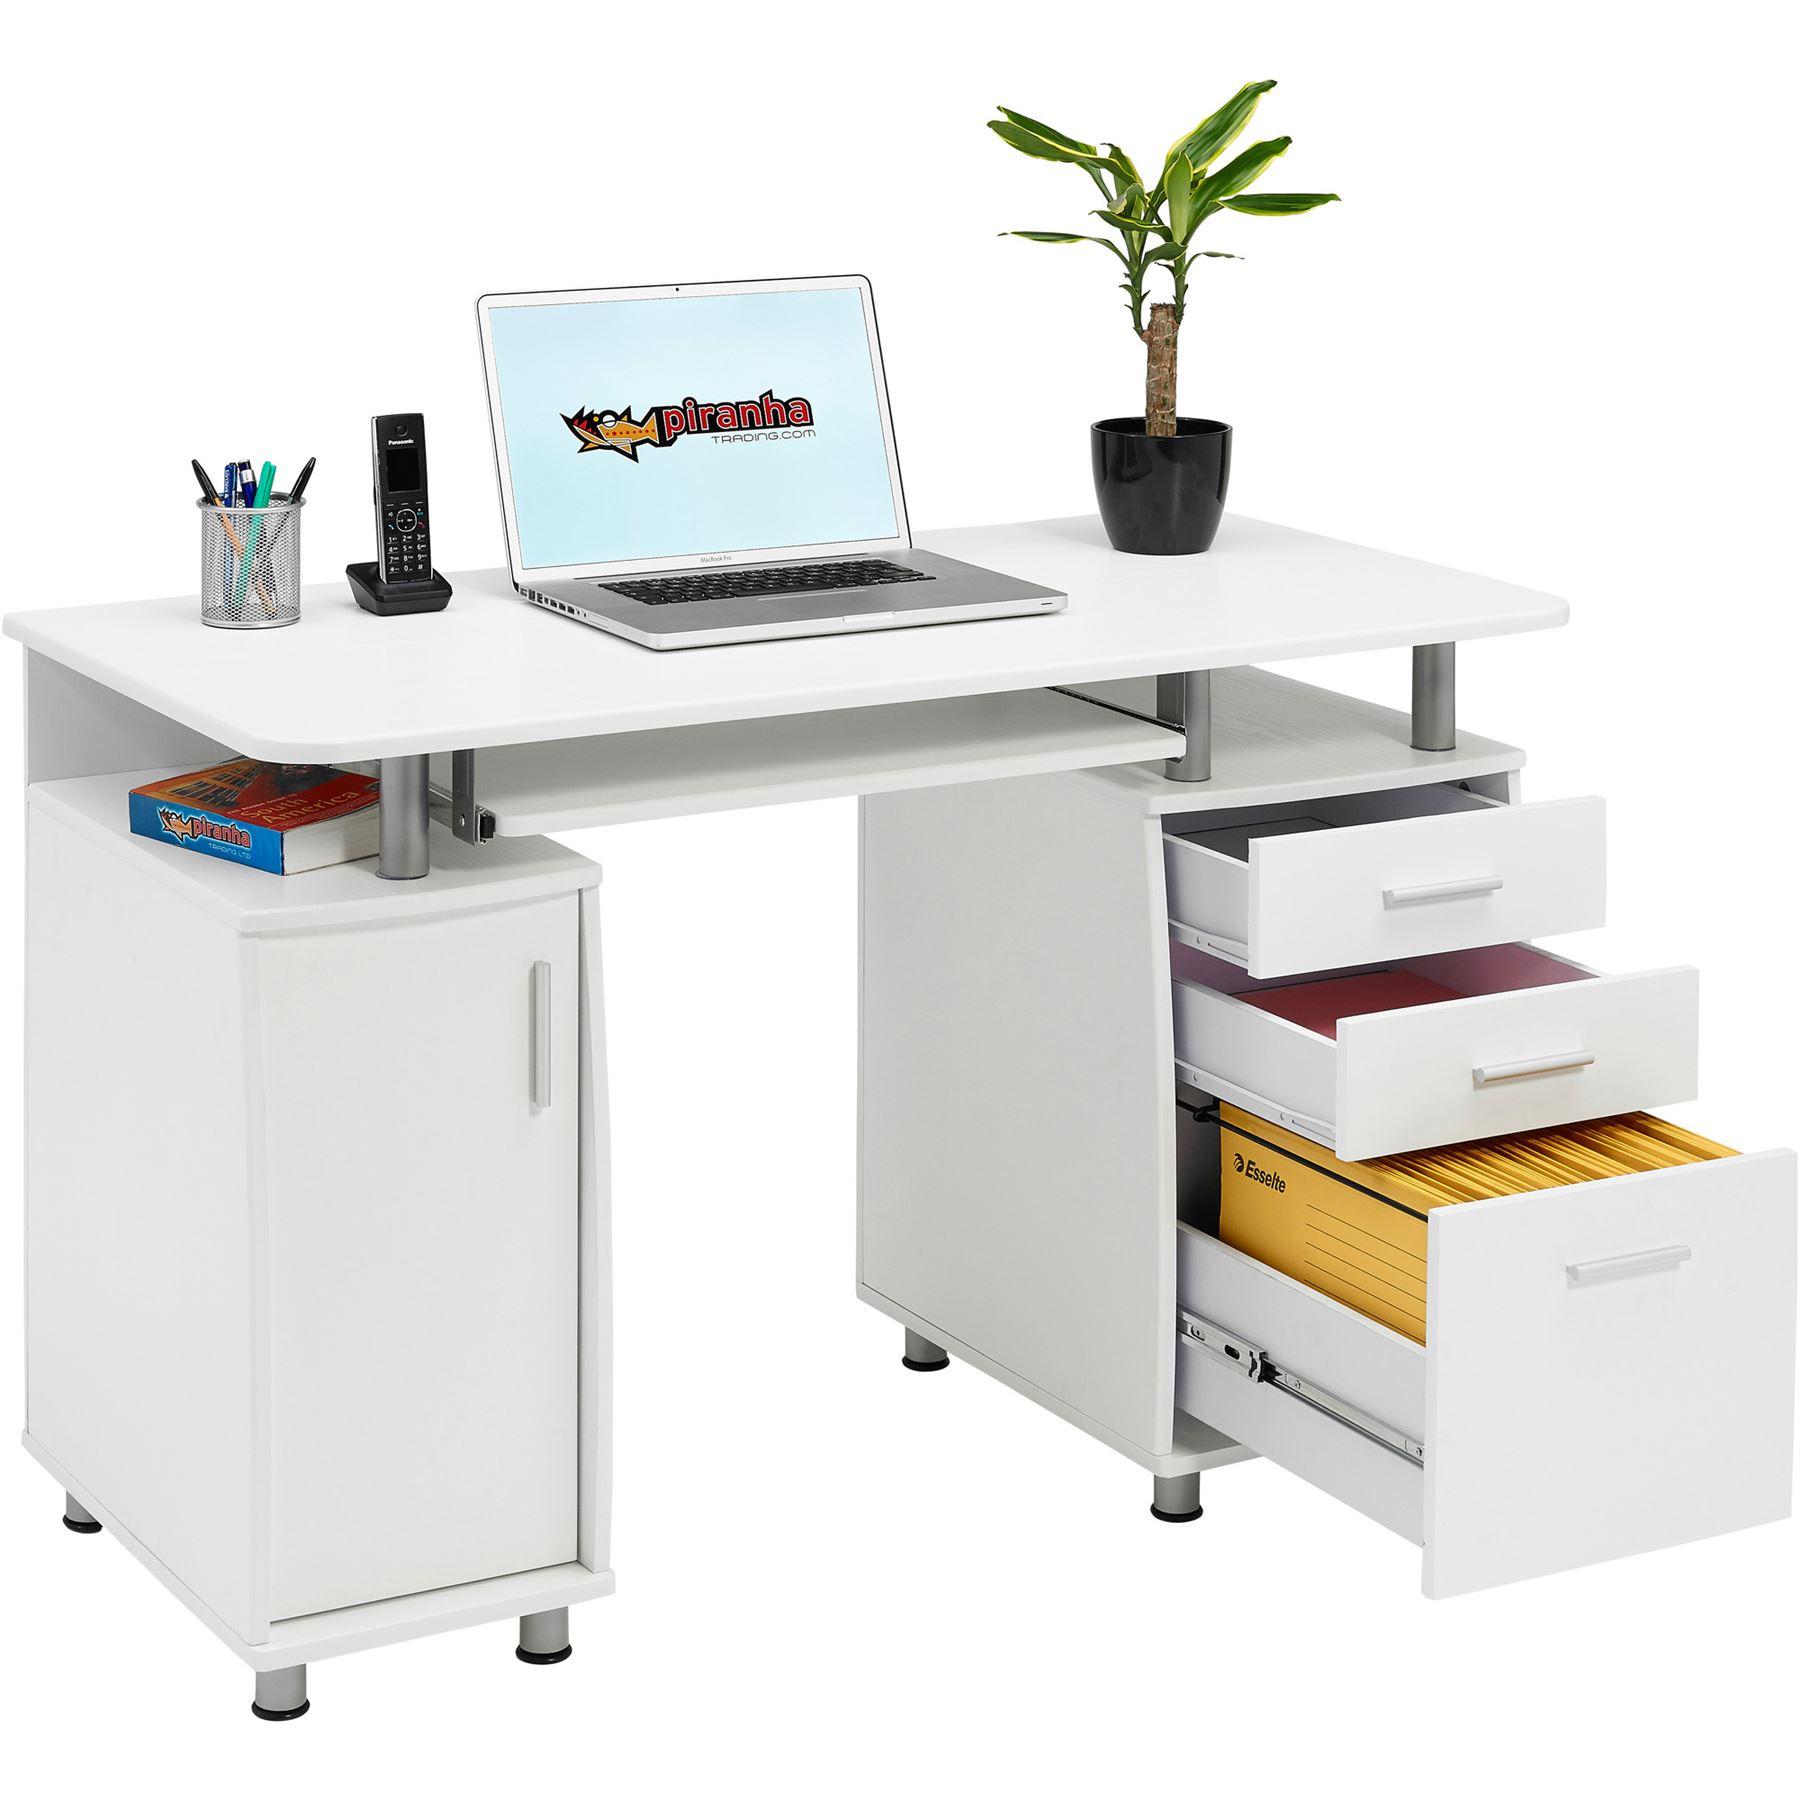 computer desk with storage a4 filing drawer home office piranha emperor pc 2s 5060230842318 ebay. Black Bedroom Furniture Sets. Home Design Ideas